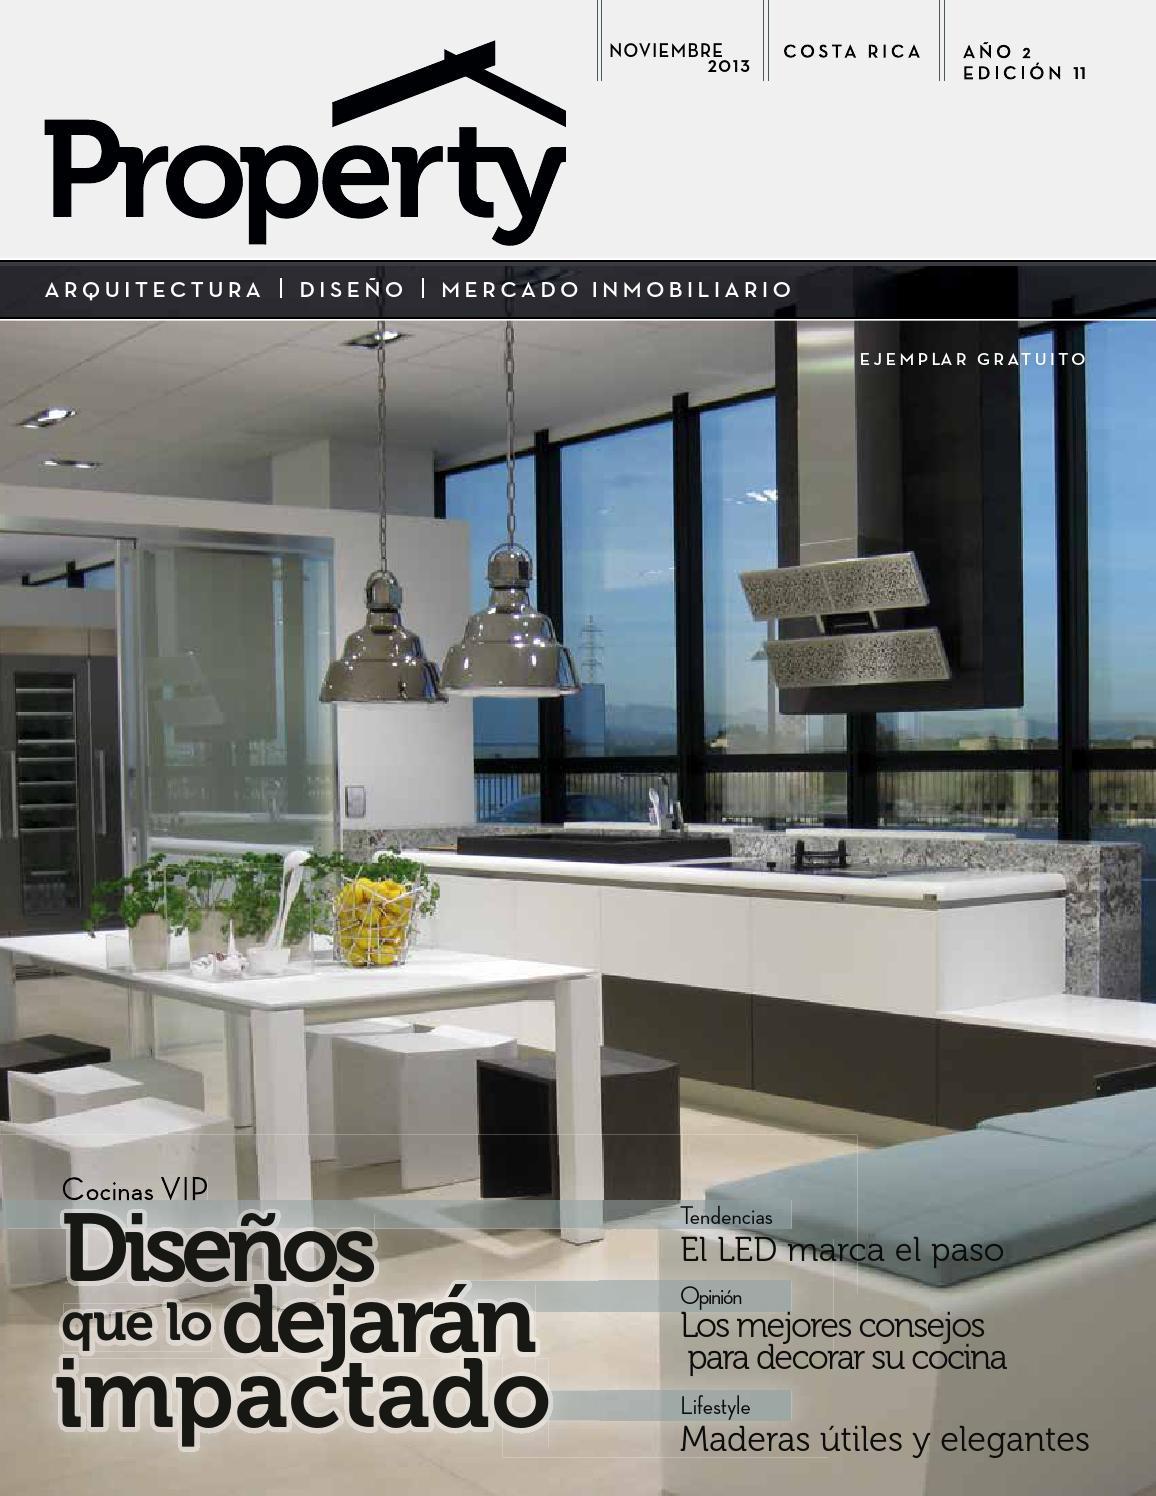 Property magazine - noviembre 2013 by 1205 Doce Cerocinco Magazine ...